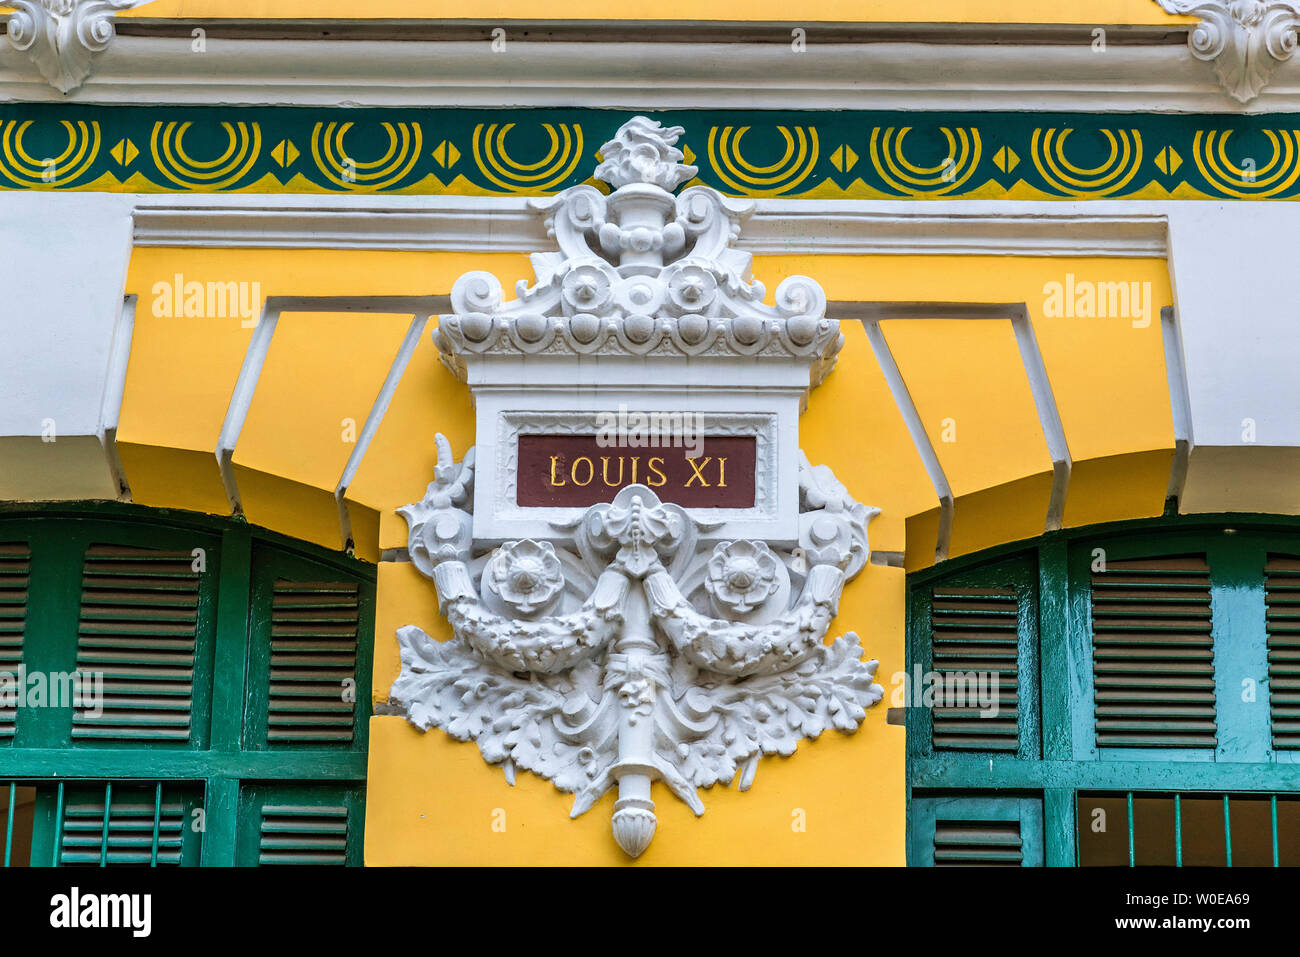 Vietnam, Ho Chi Minh (Saigón), detalles de la fachada de la Oficina Central de Correos (del siglo xix). Foto de stock